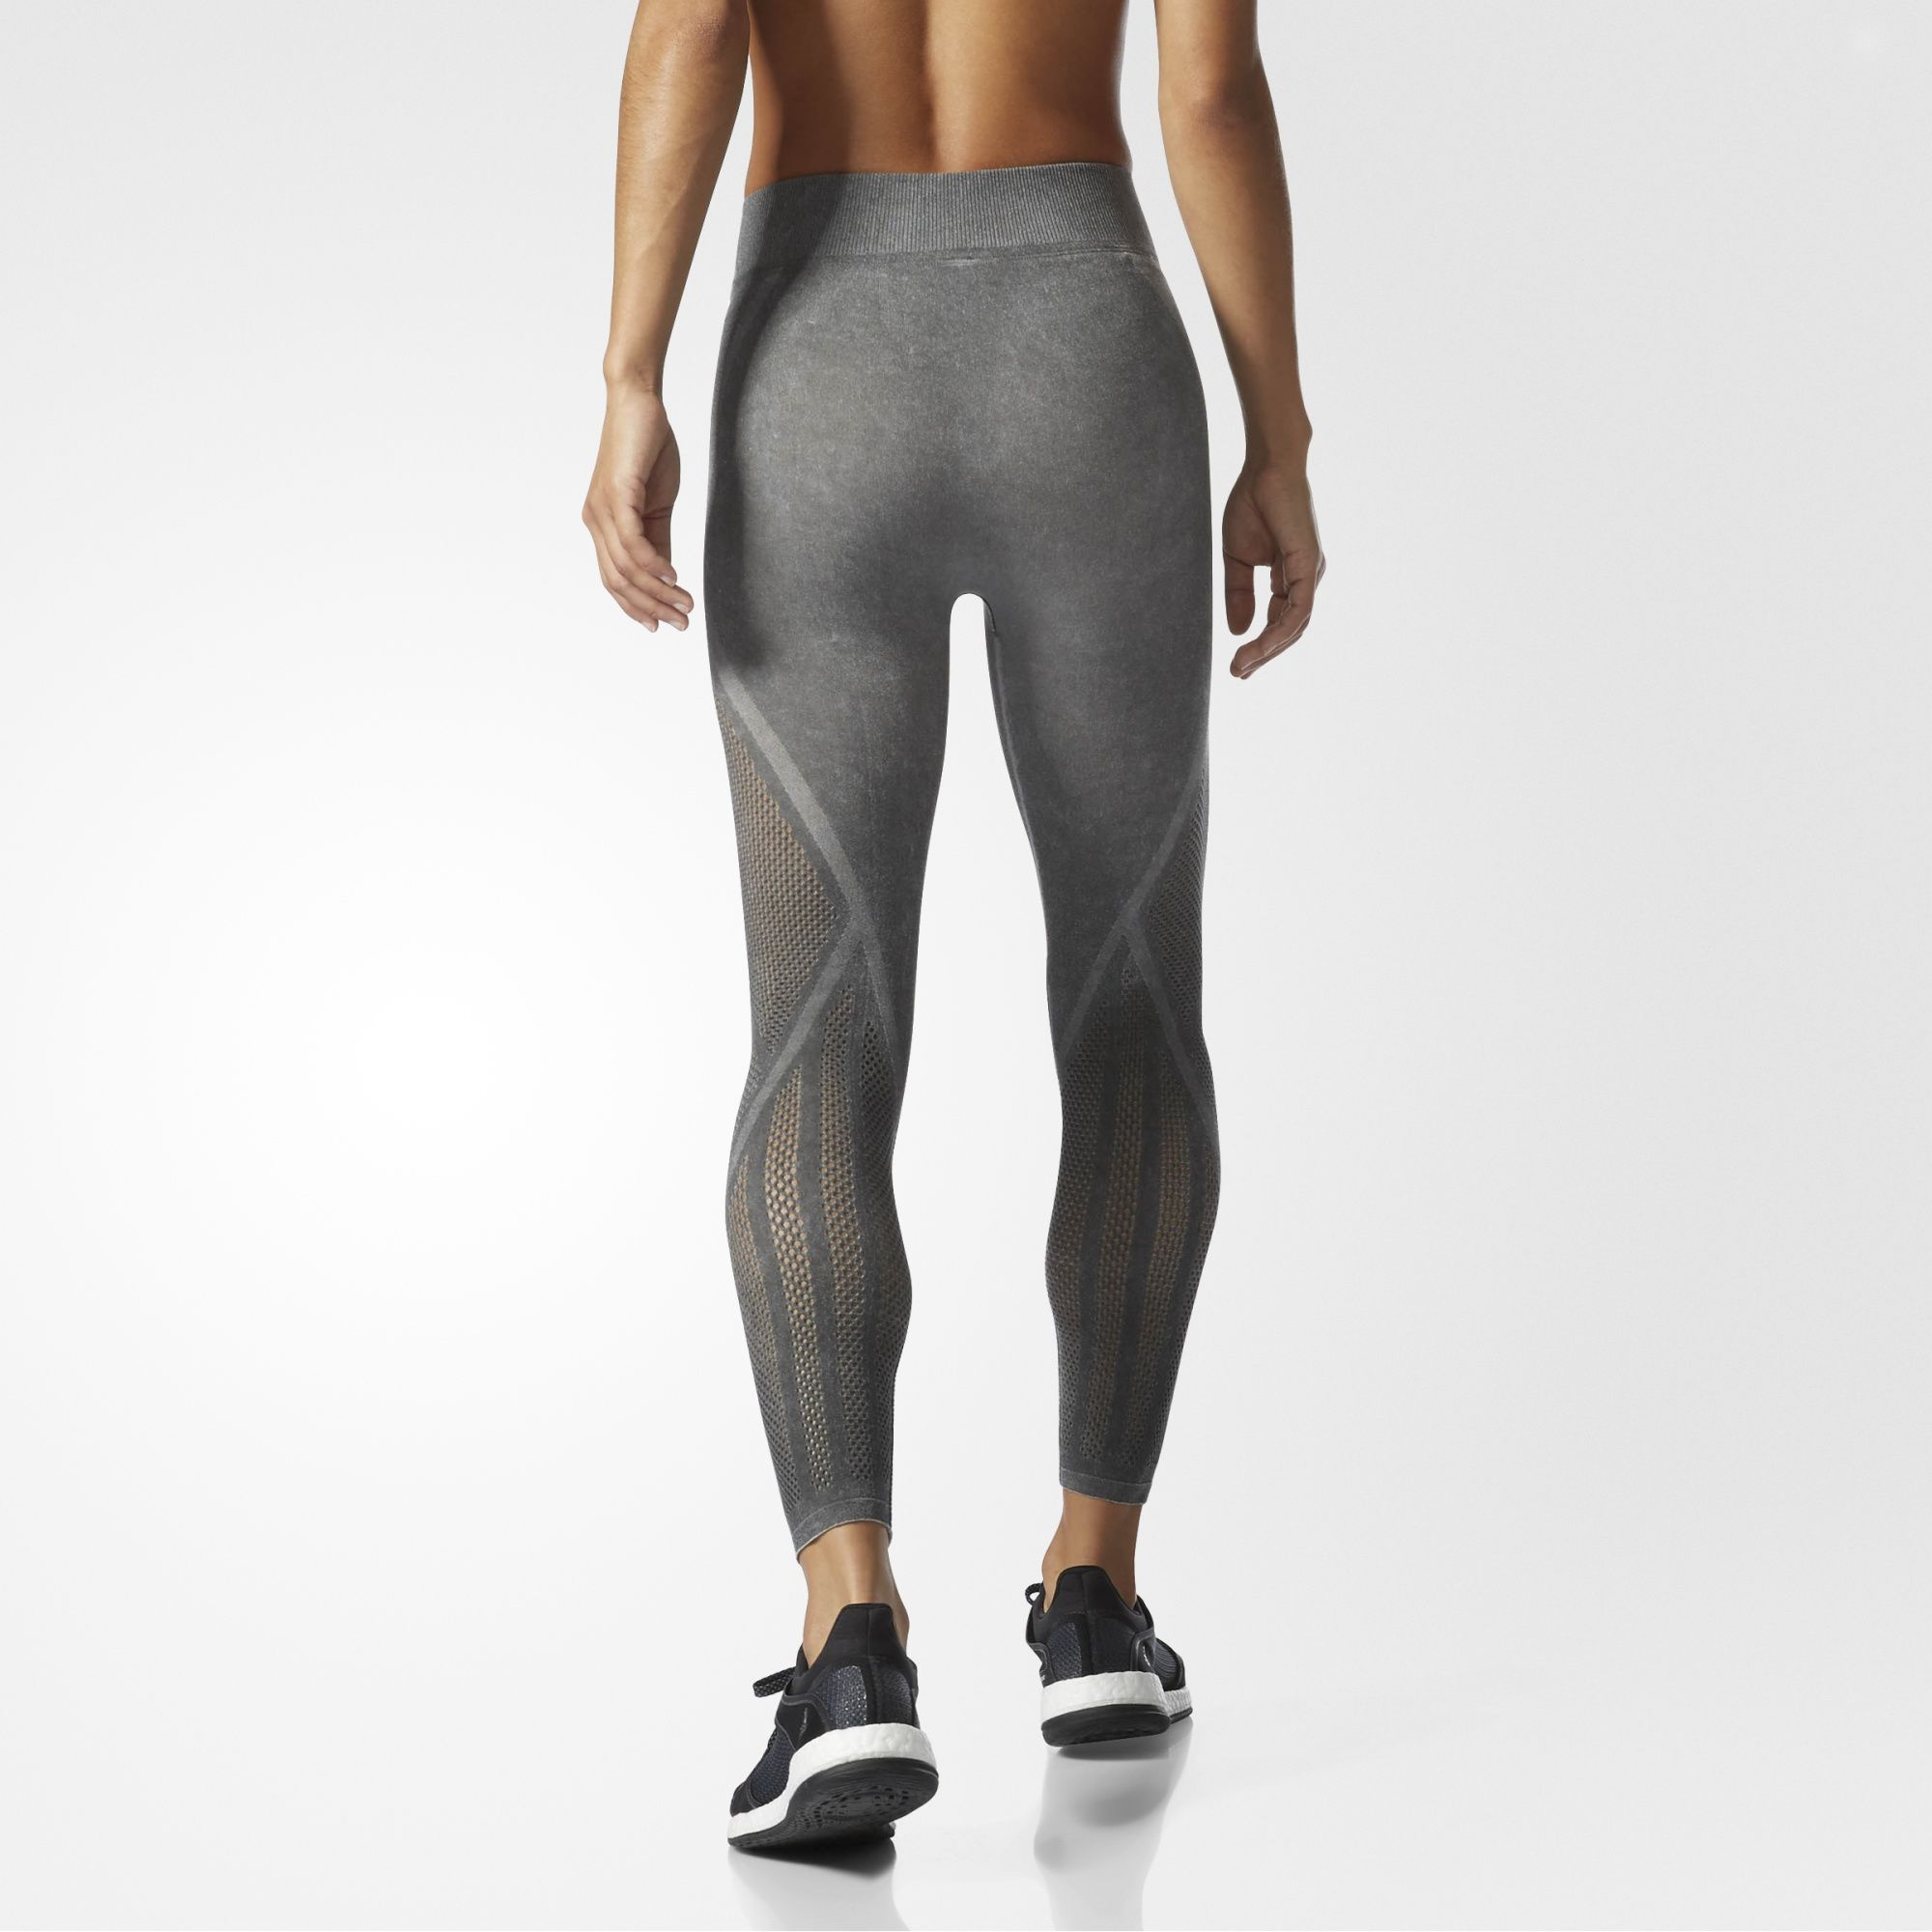 80797b169bebe Wanderflow Warp Knit Tights | My Style | Adidas, Tights, Black adidas